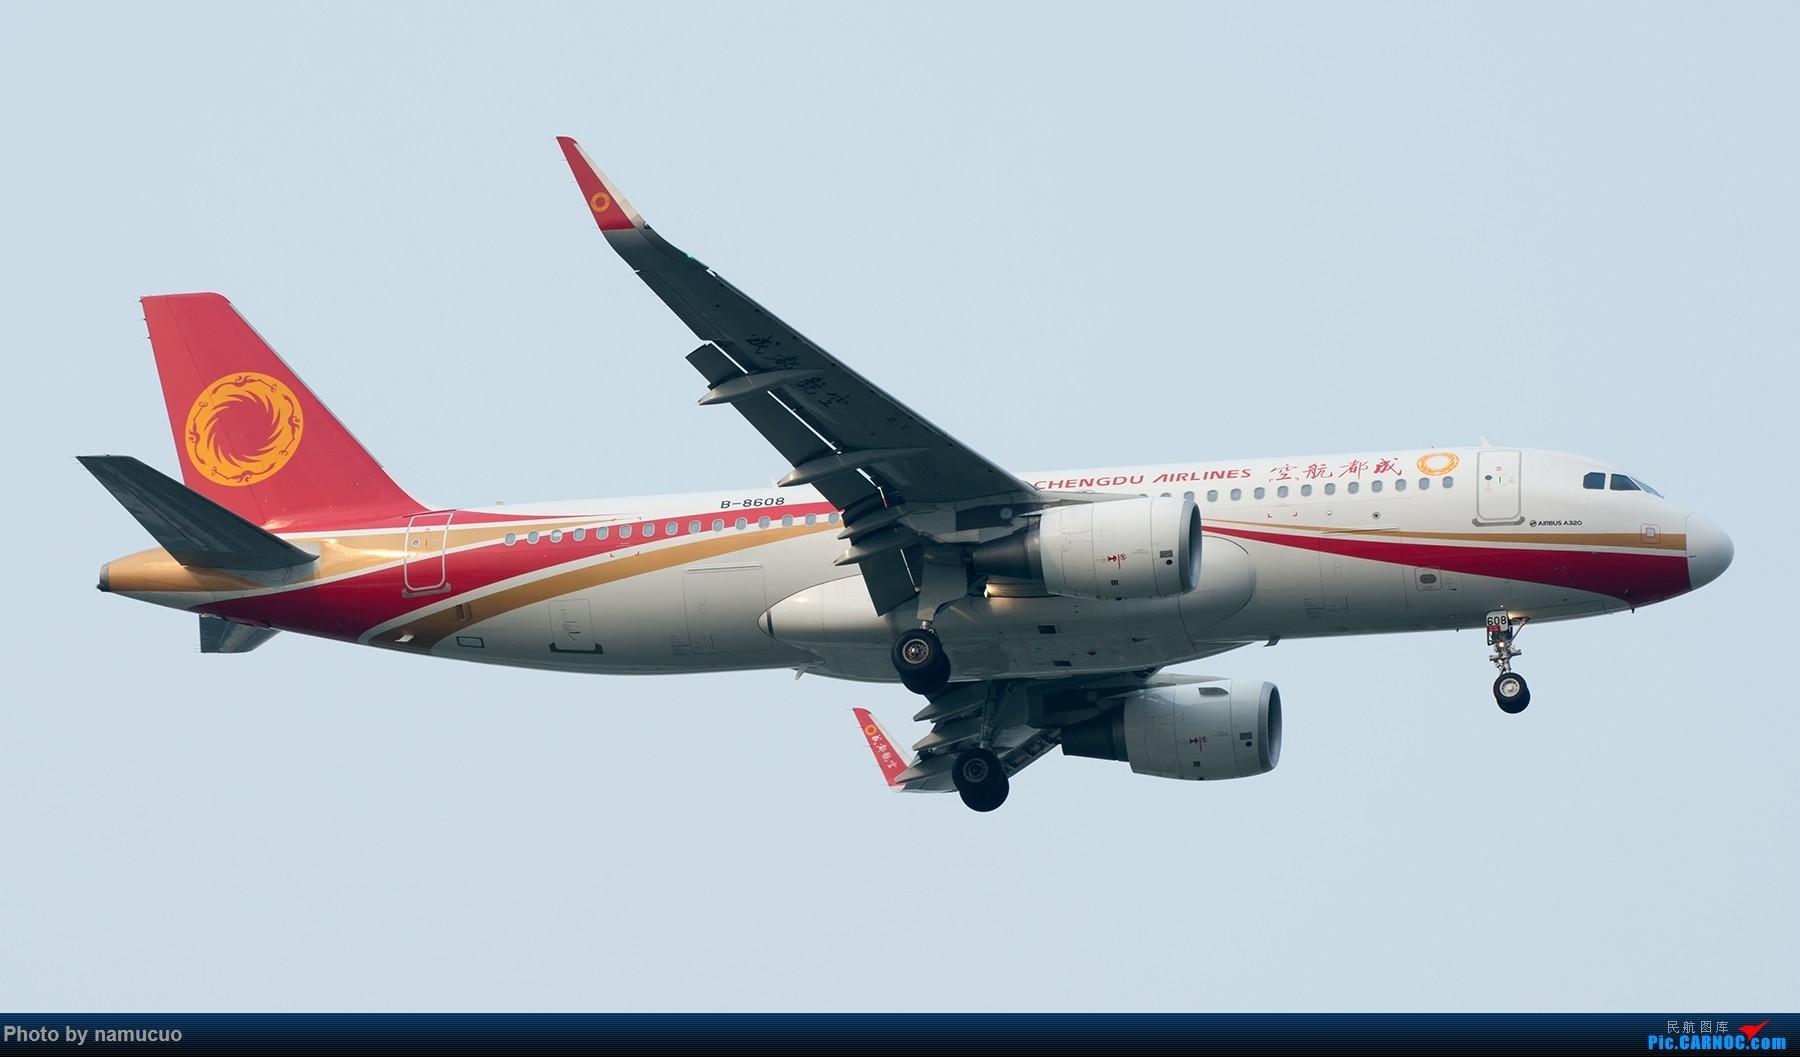 Re:[原创]【TSN】B-000D试飞,快降落时又突然加速拉起 AIRBUS A320-200 B-8608